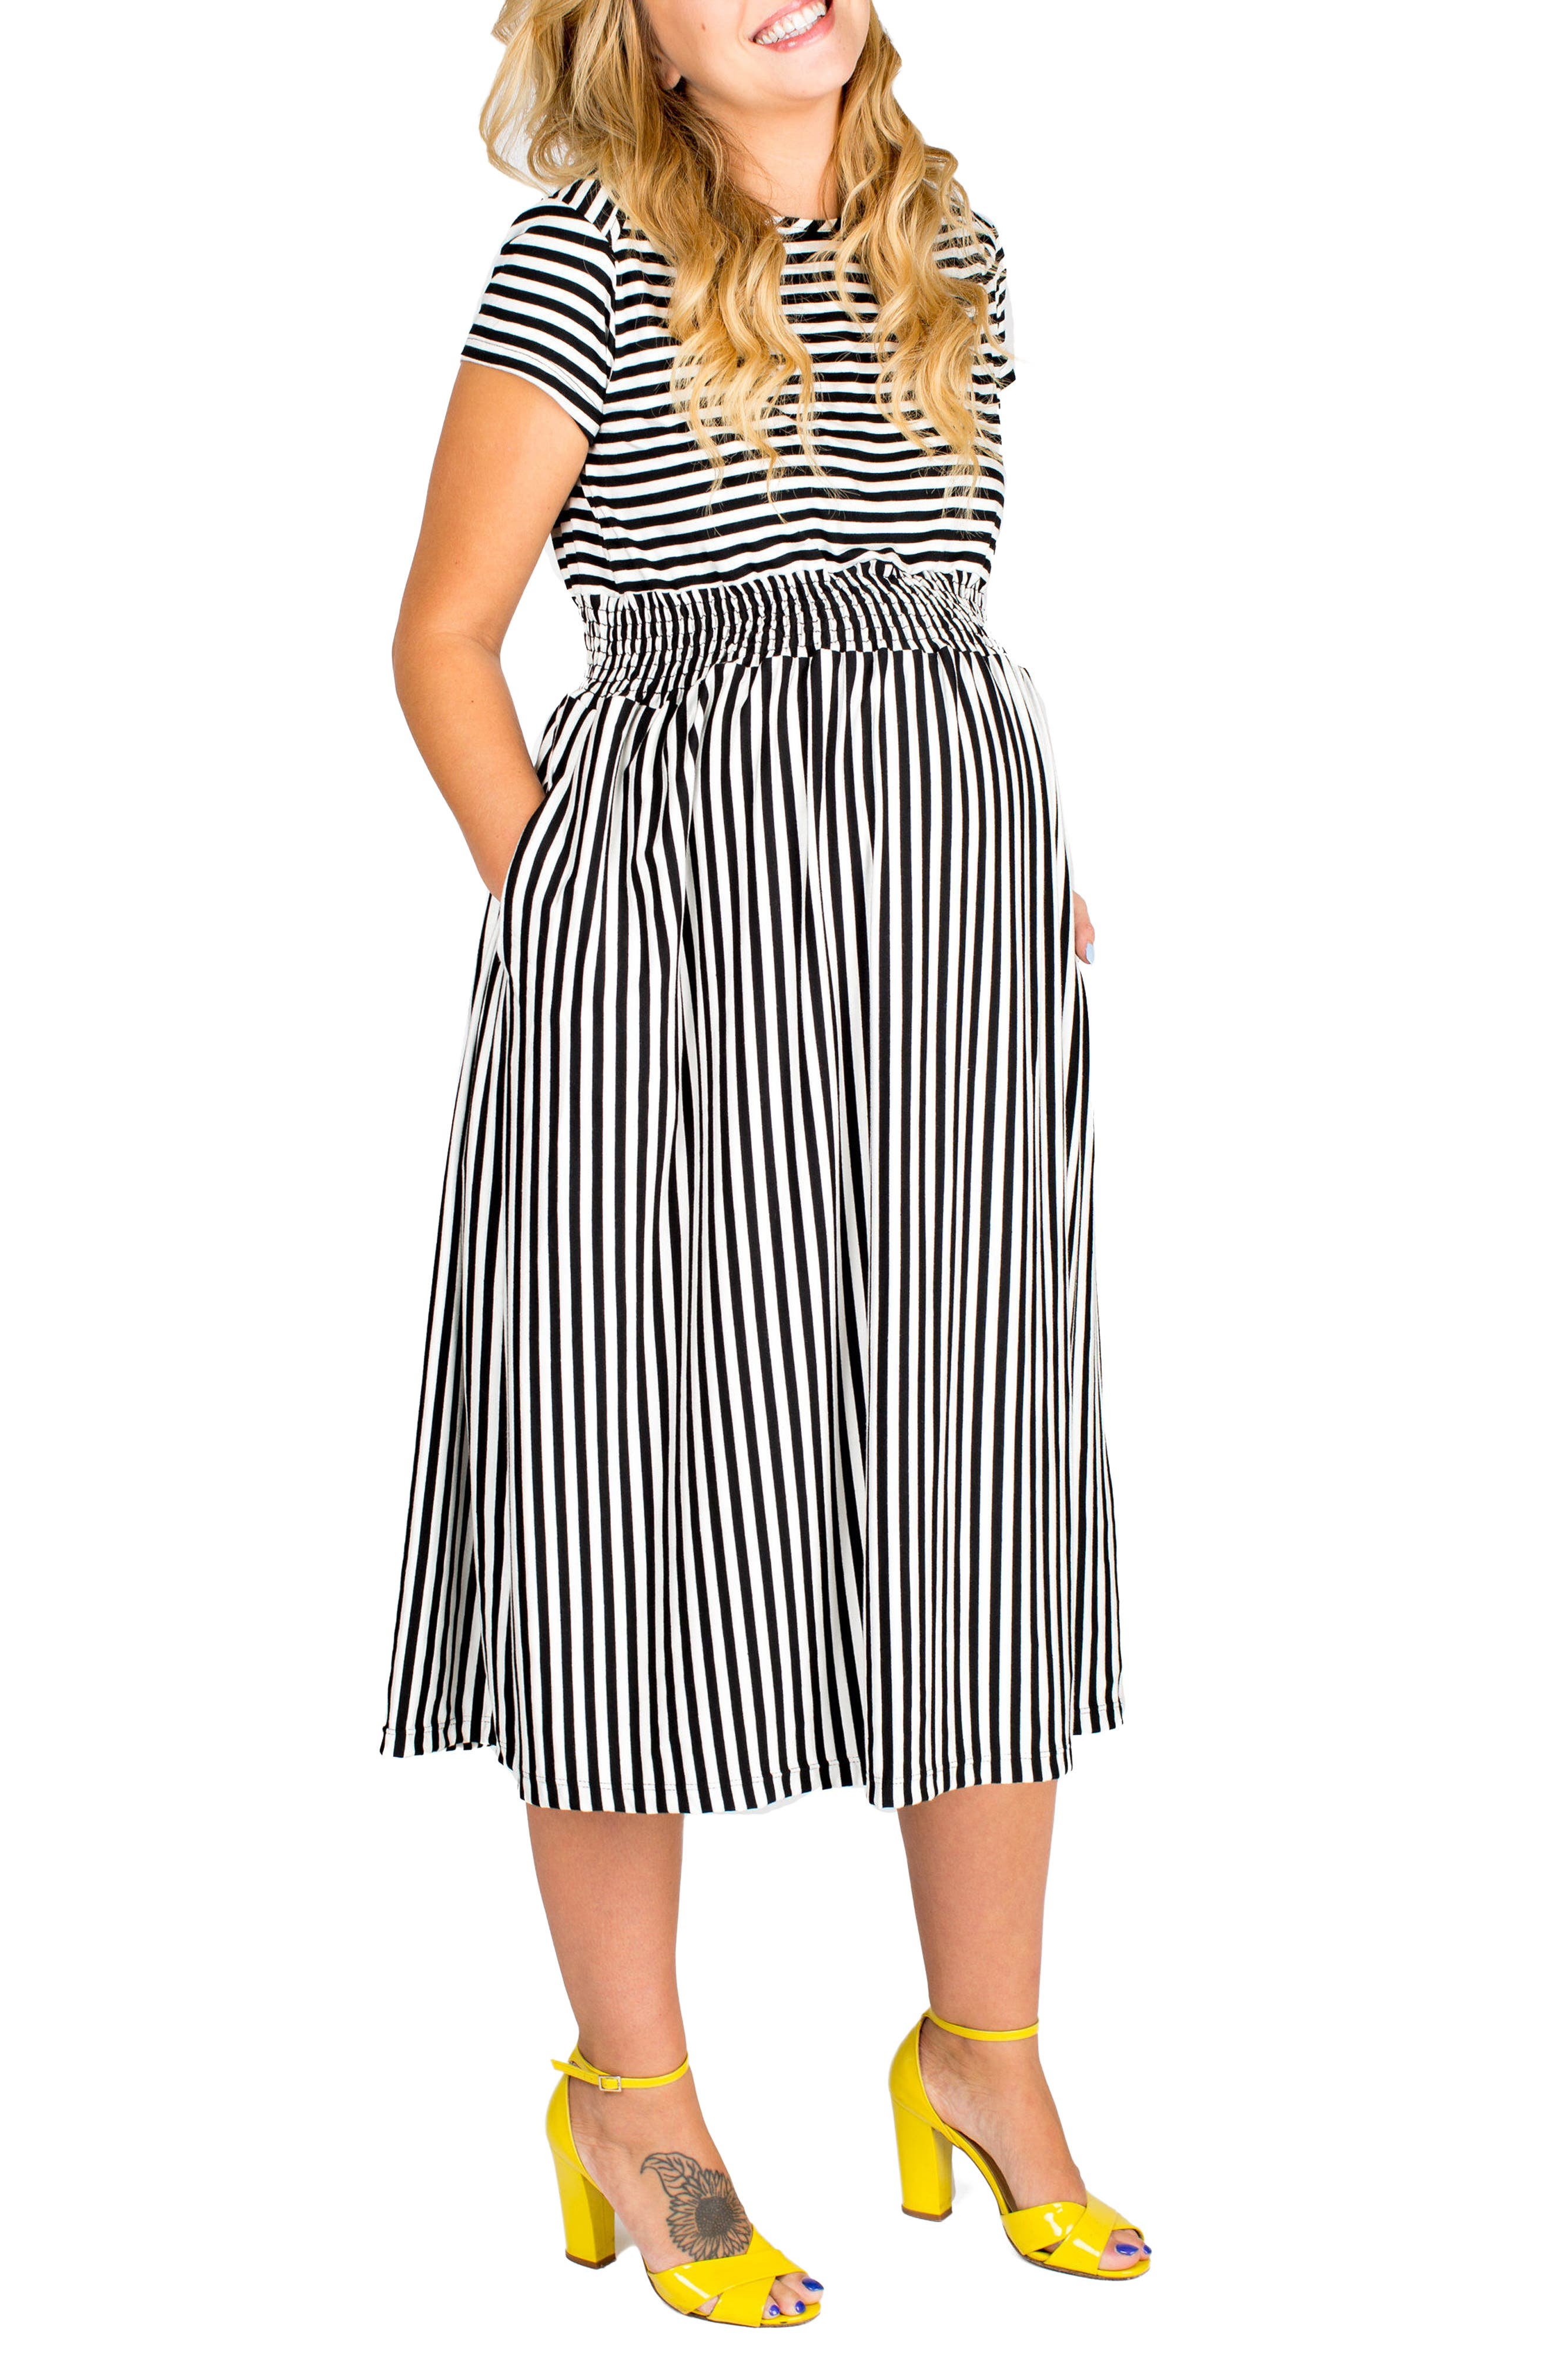 NOM MATERNITY Nom 'Max' Print Midi Maternity Dress, Main, color, 002